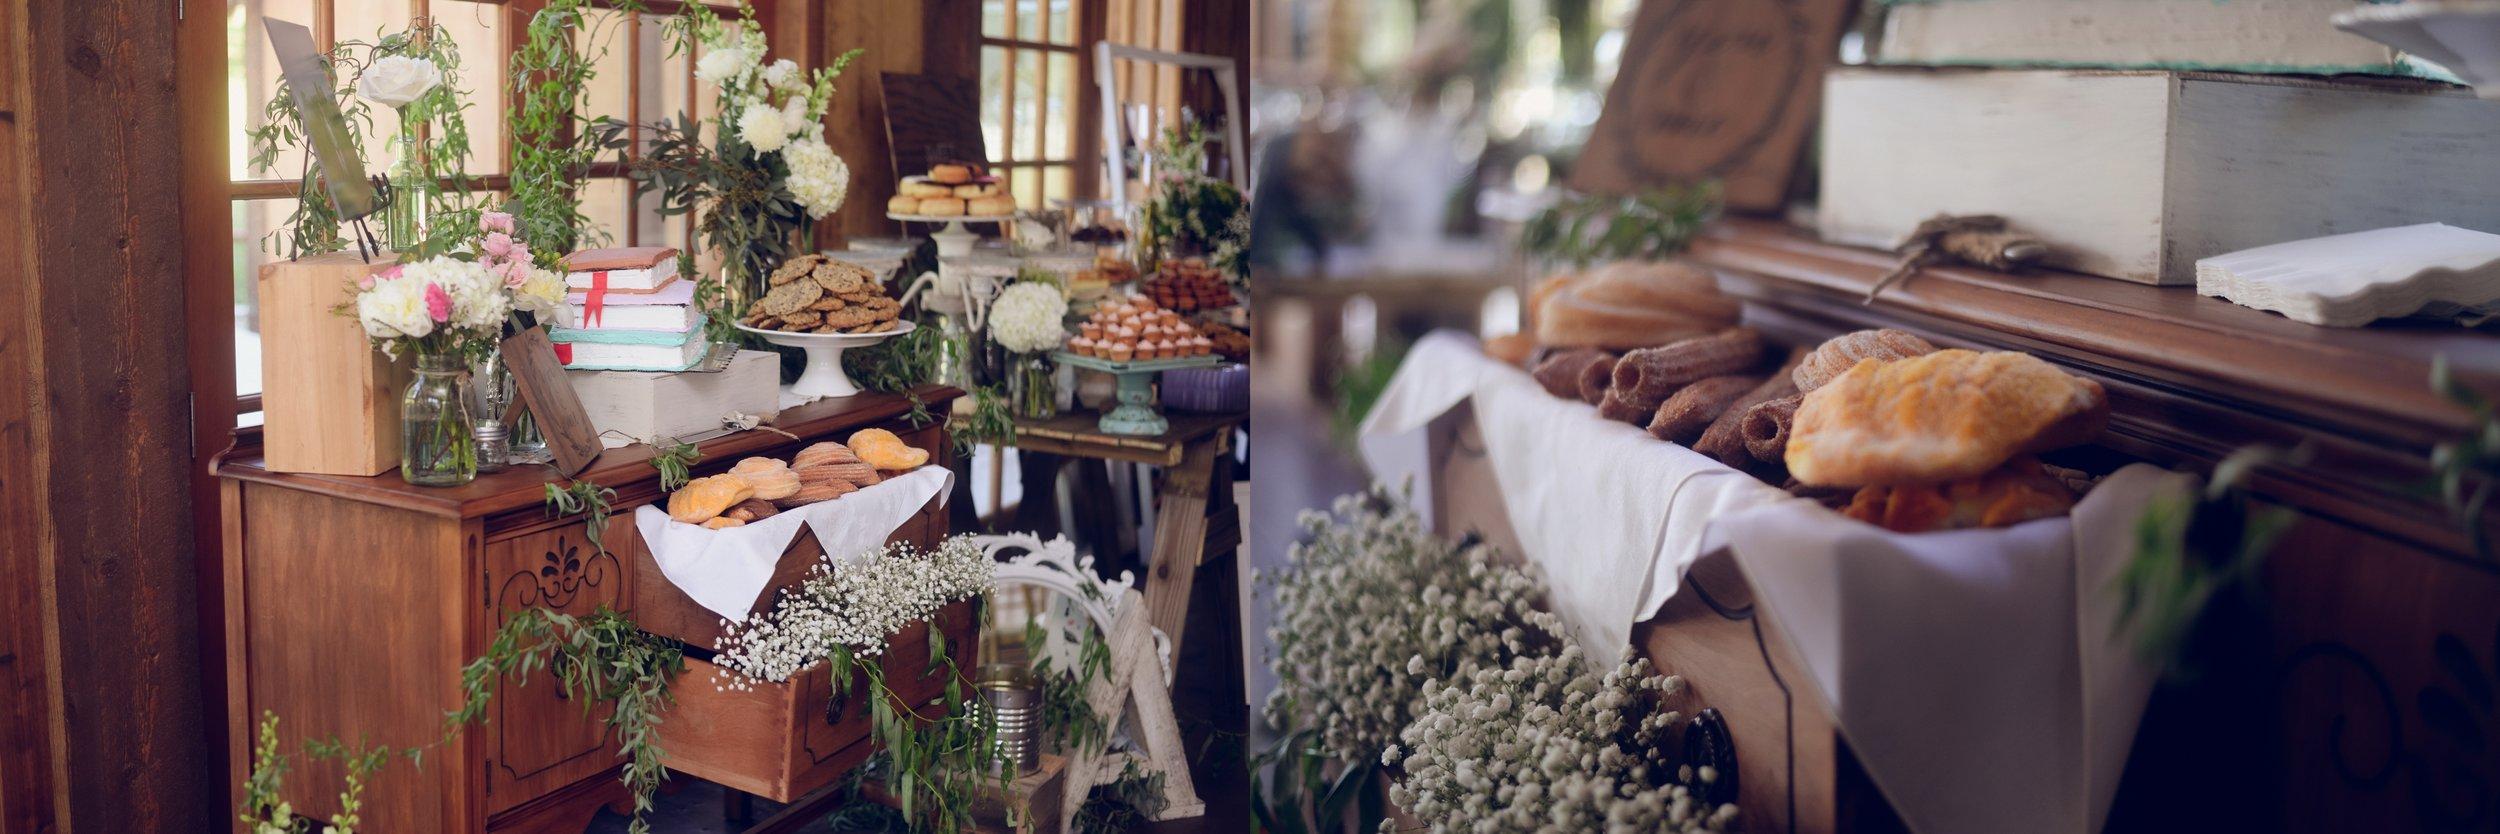 Lonestar-Mansion-Fort-Worth-Wedding-Planner-Burleson-Wedding-Venue_19.jpg